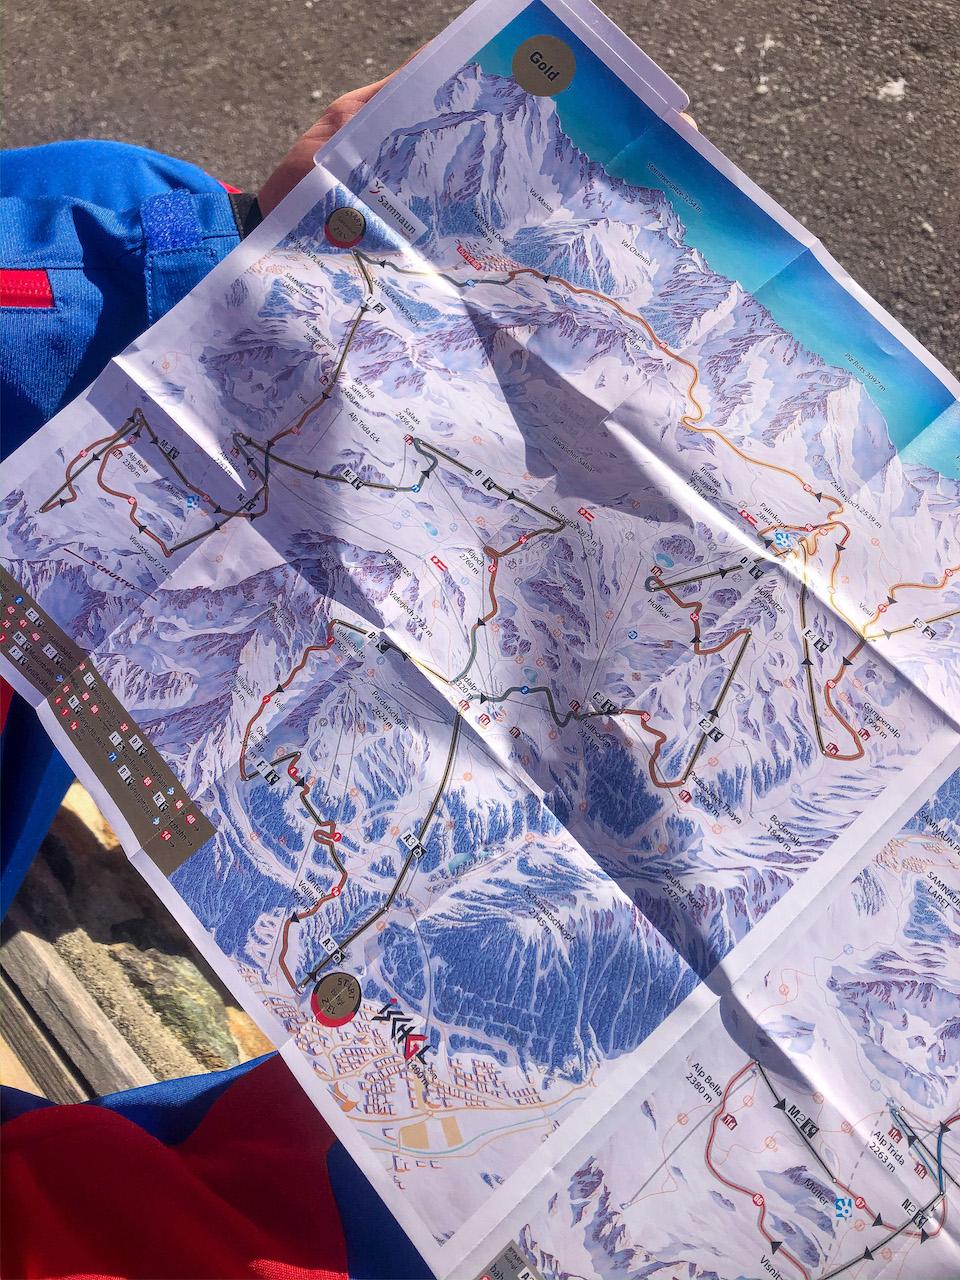 Ischgl ski - wintersport tips - Samnaun - skimap Ischgl - Schhmugglerrunden/ Smuggler's circuits